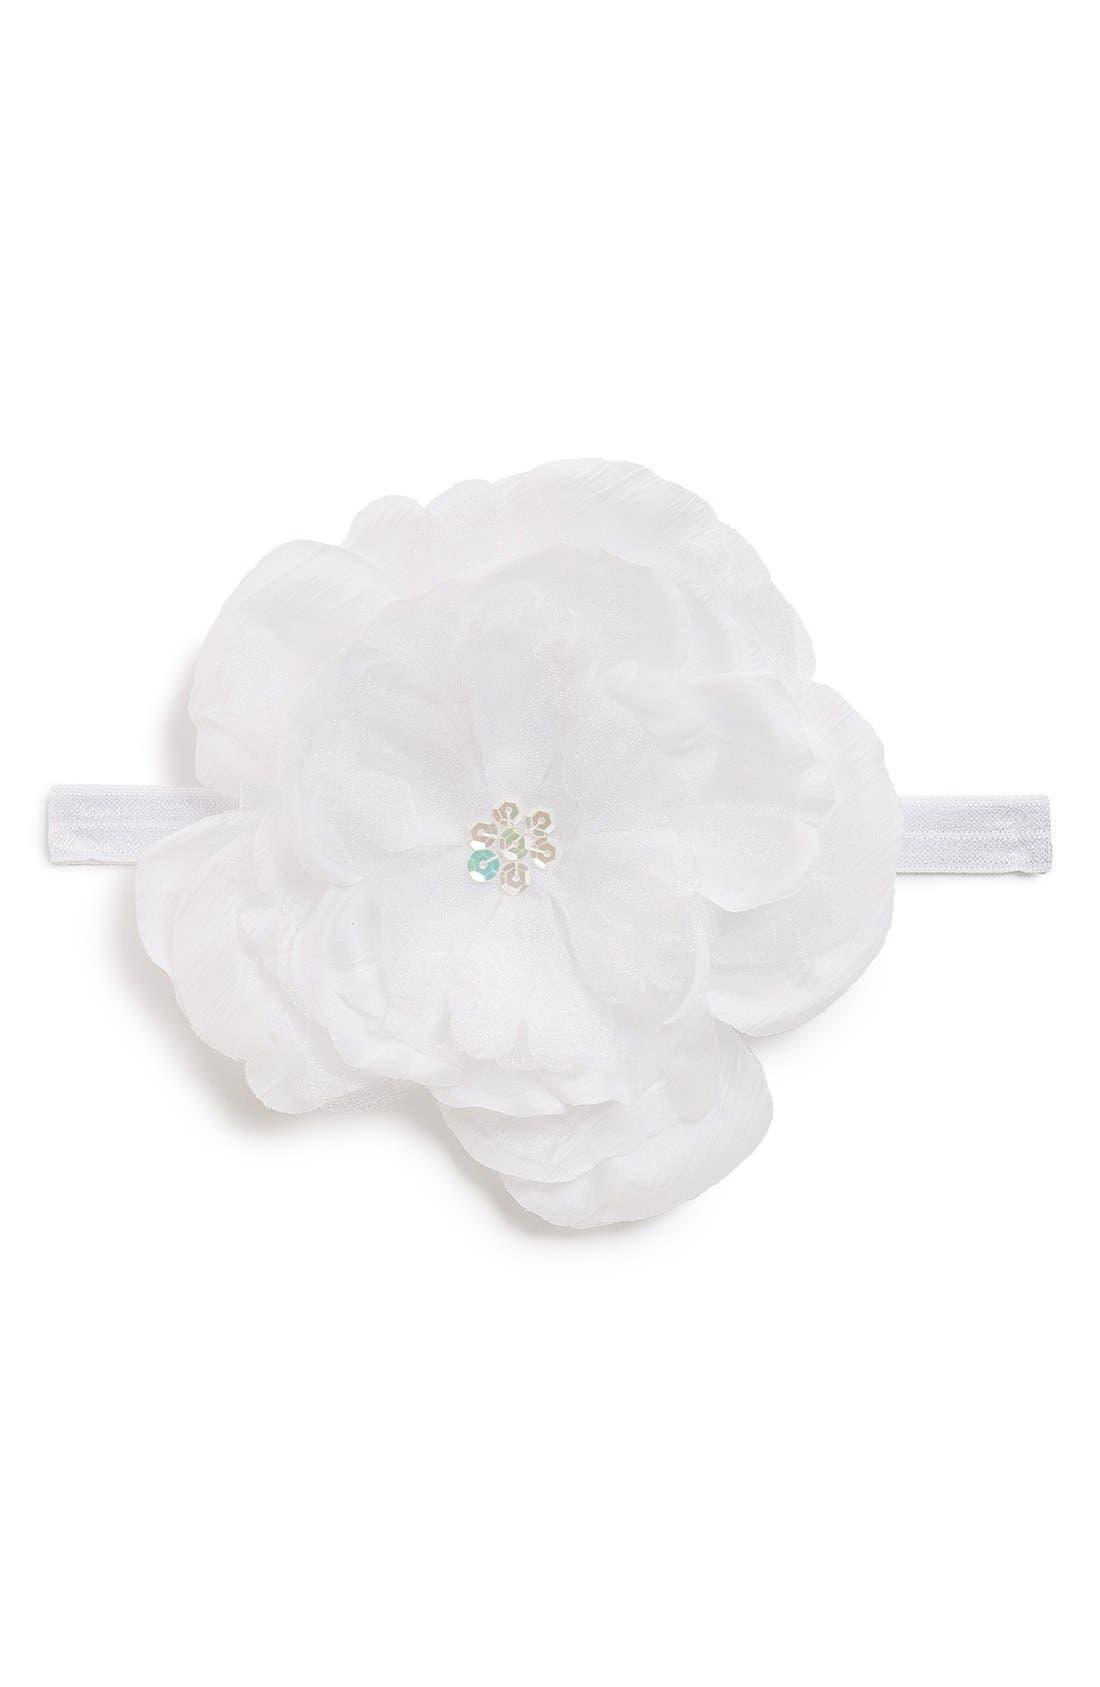 Flower Headband,                         Main,                         color,